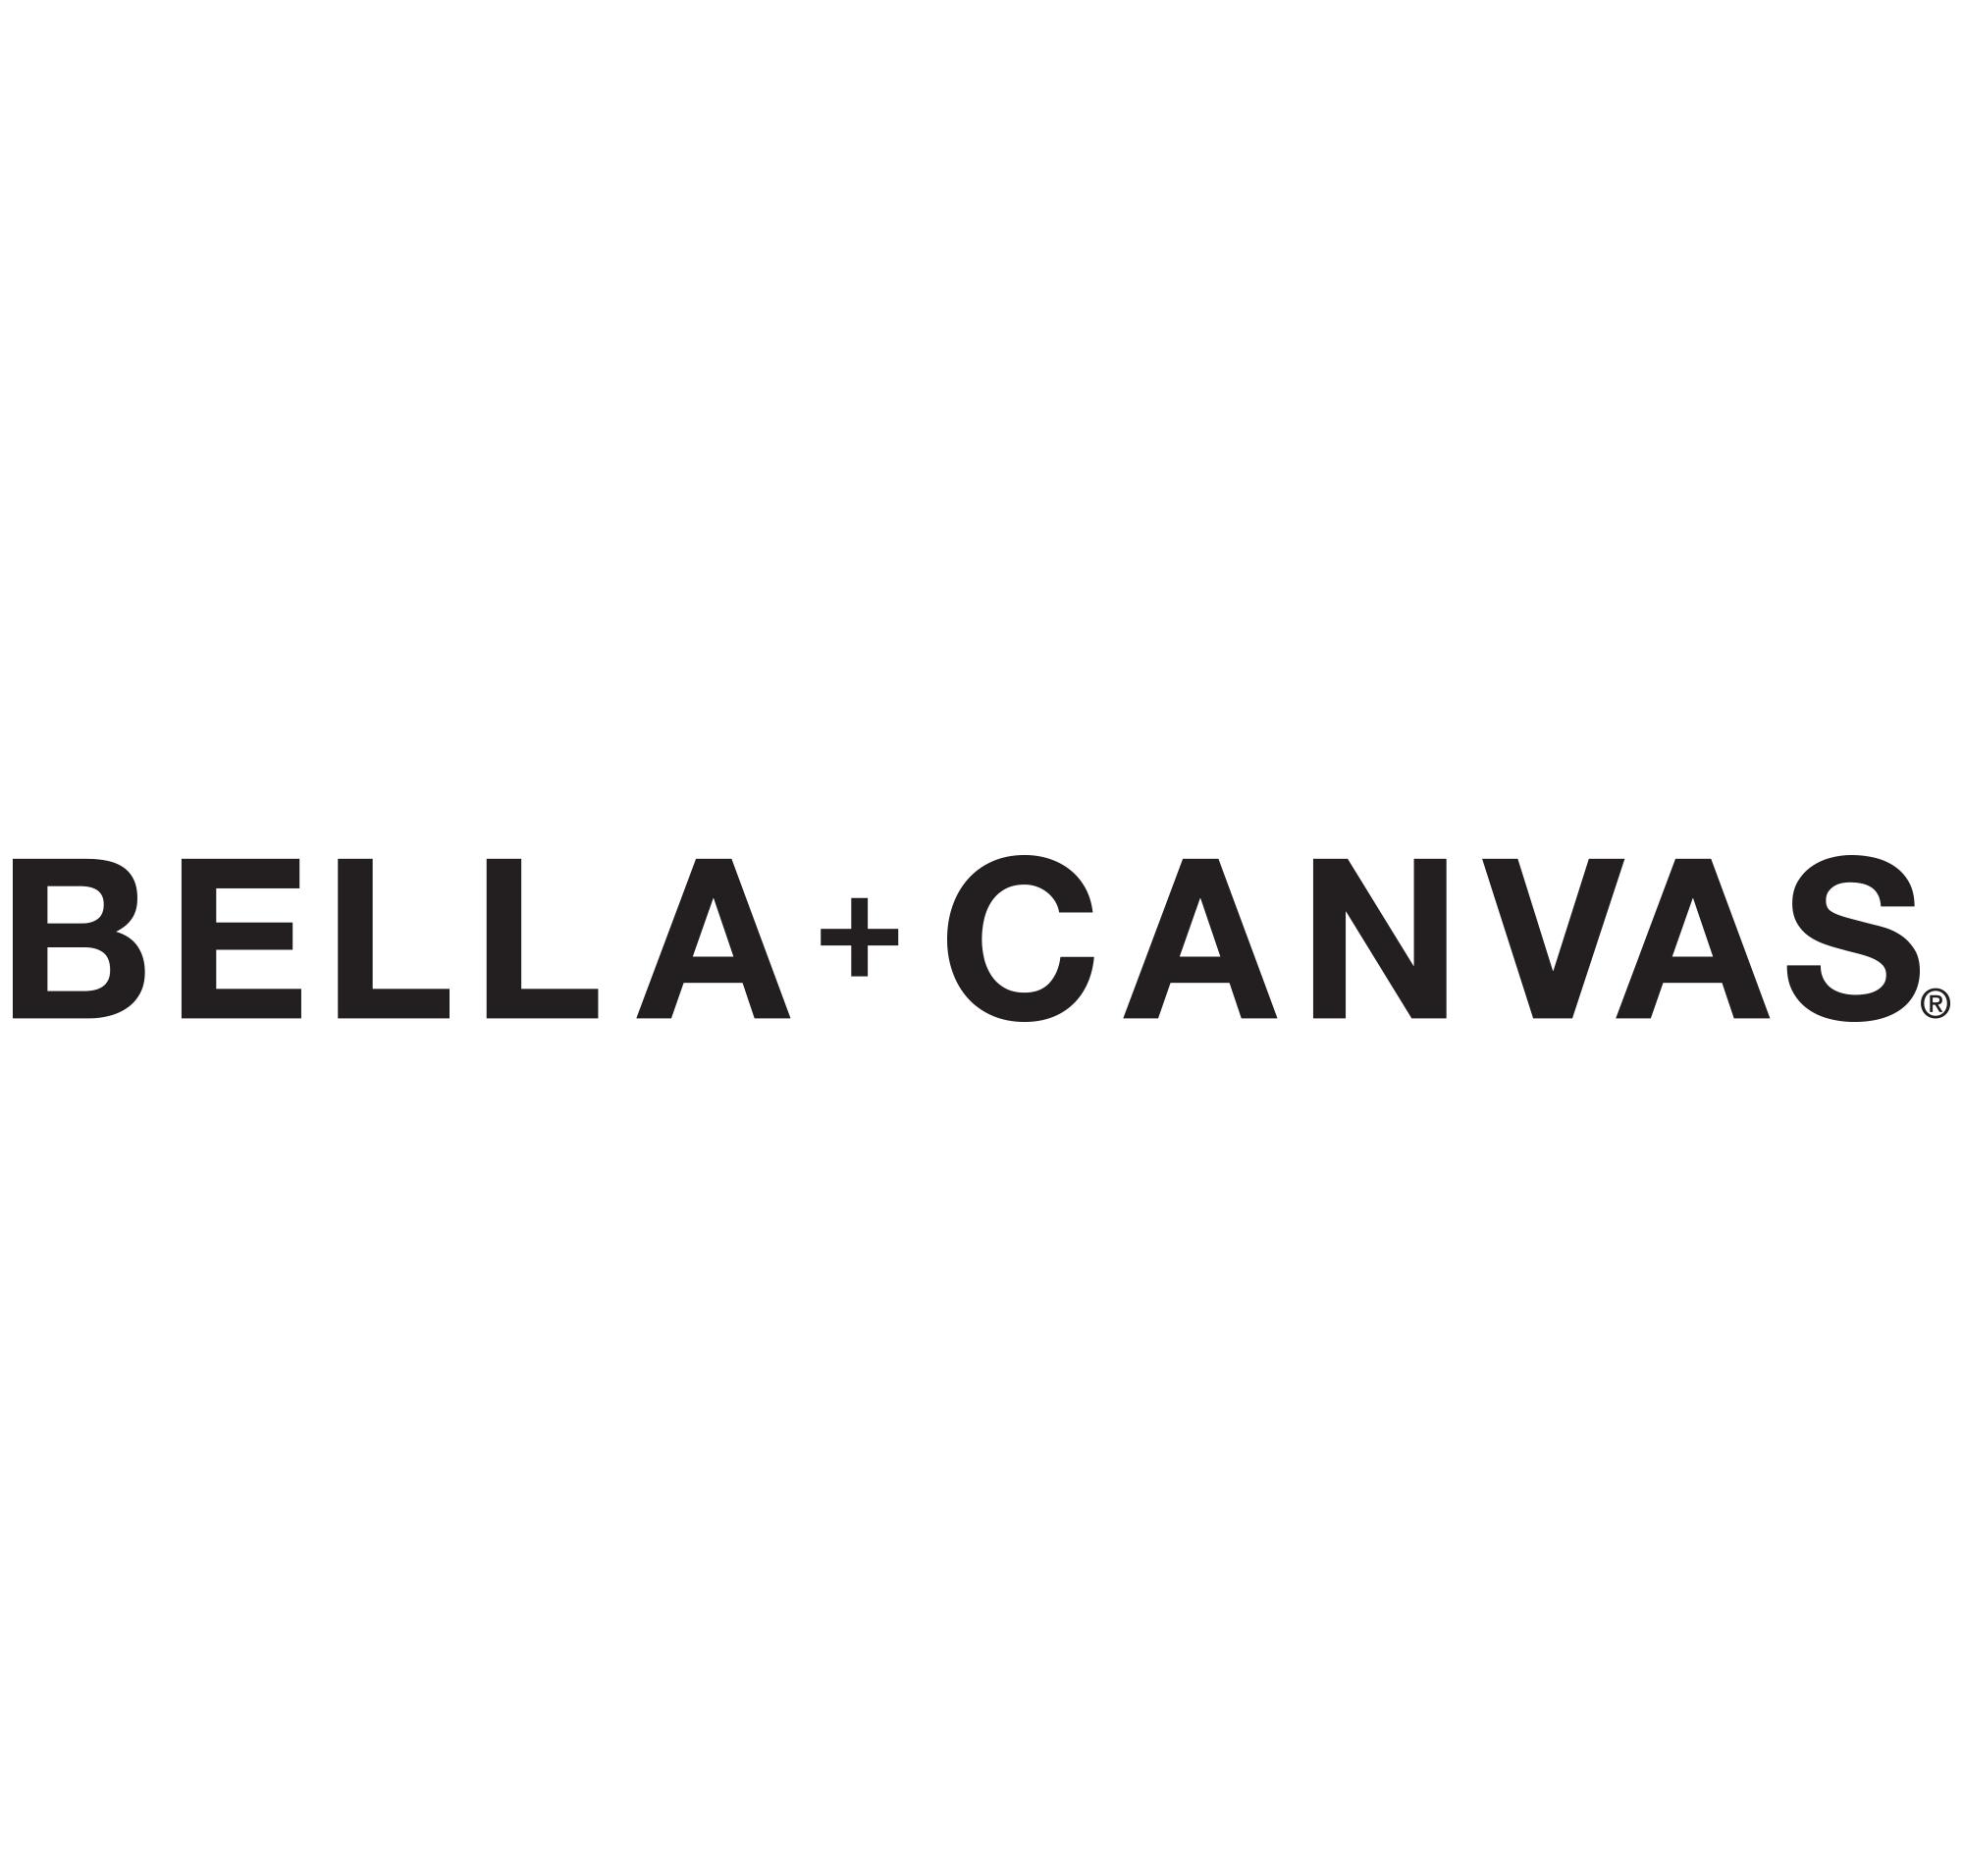 Bella_Canvas_Logo_202000px.jpg